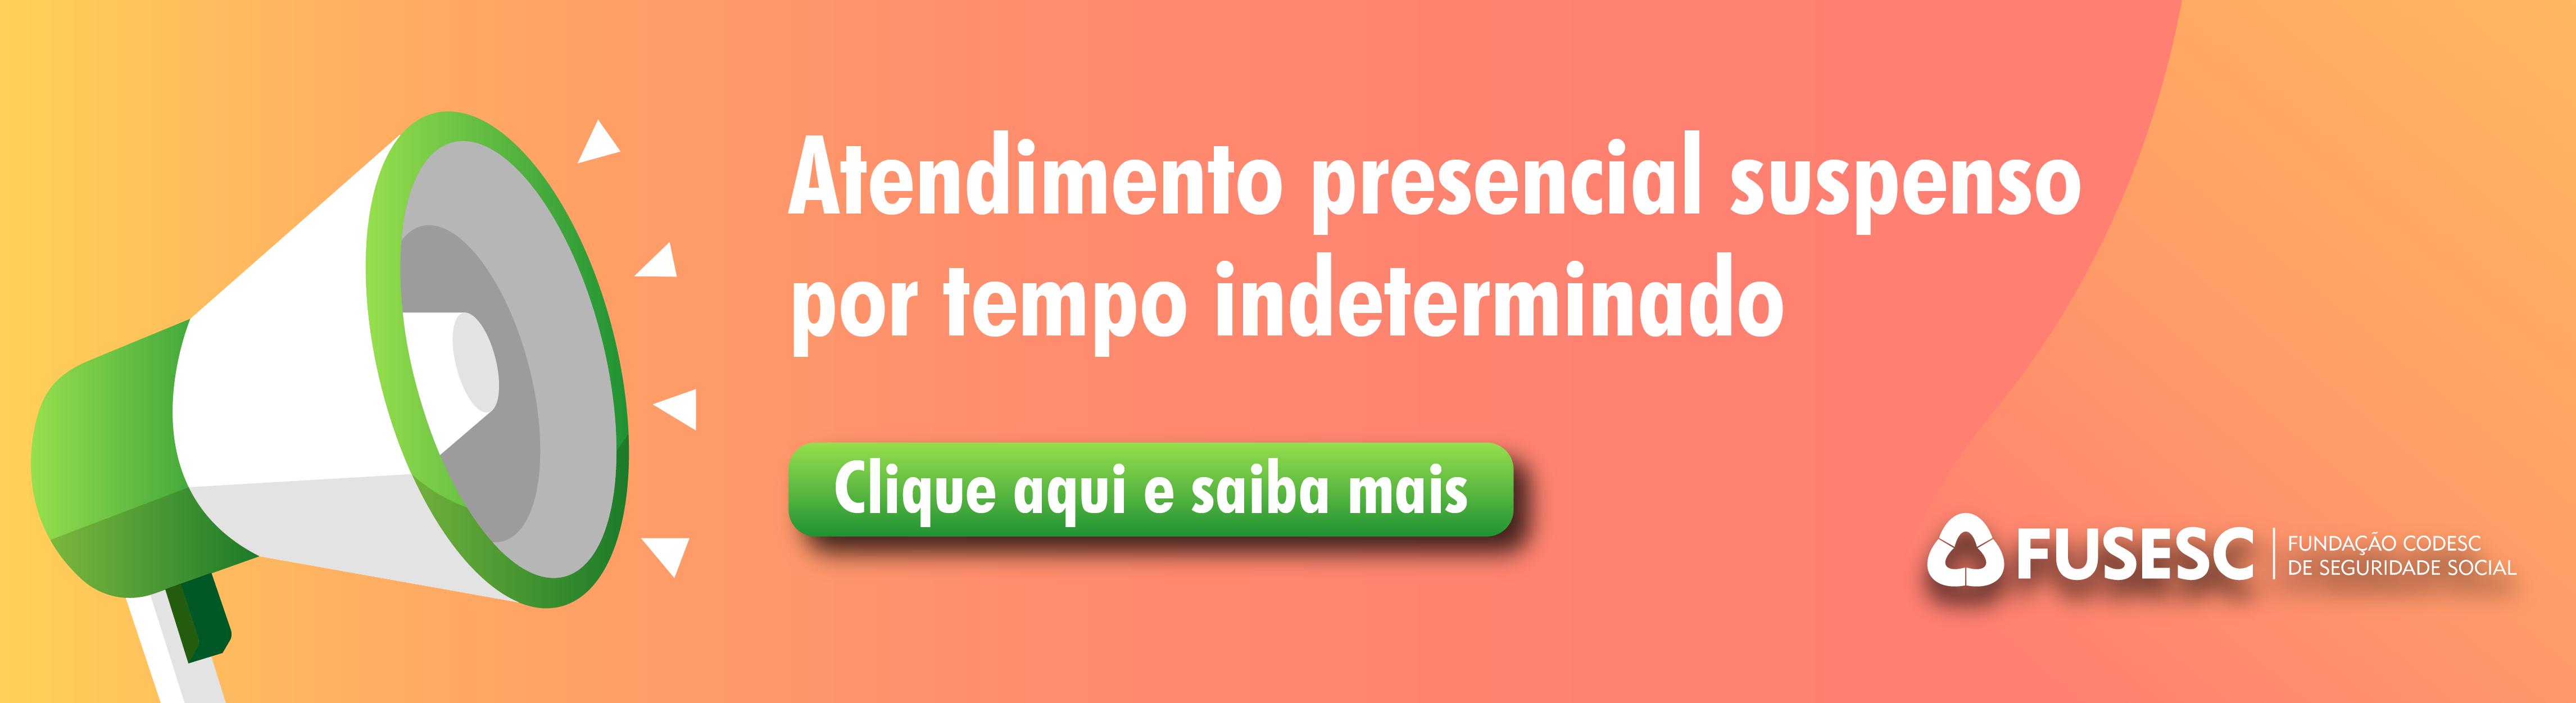 2020-Suspensão-atendimento_banner